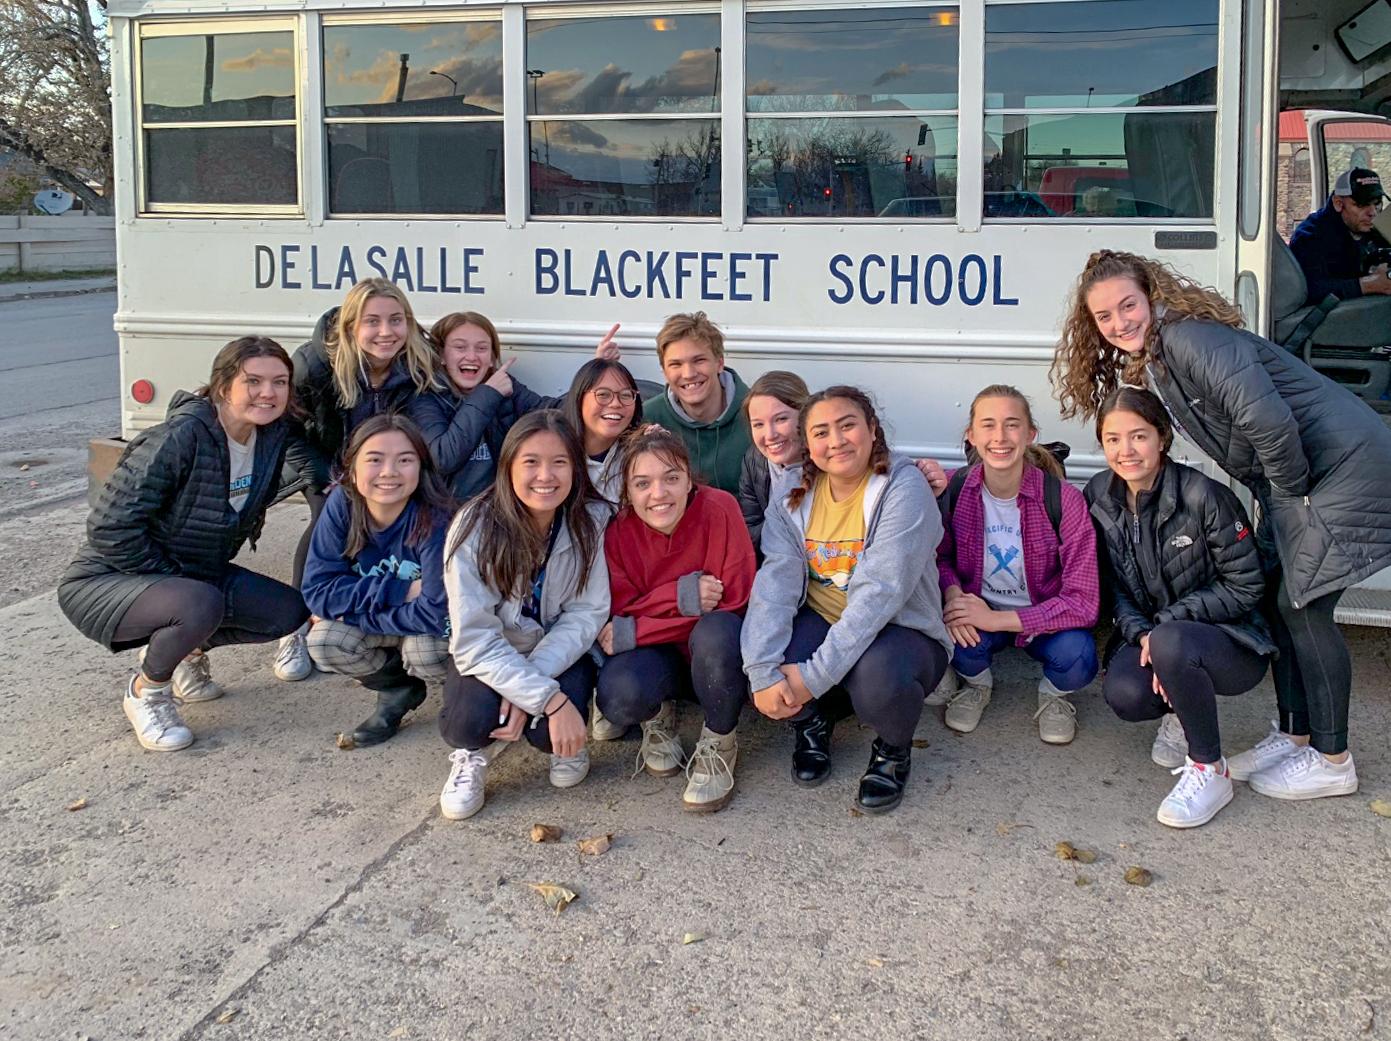 A group of 13 La Salle seniors traveled to Browning, Montana to volunteer at De La Salle Blackfeet School from Oct. 12 to Oct. 19.